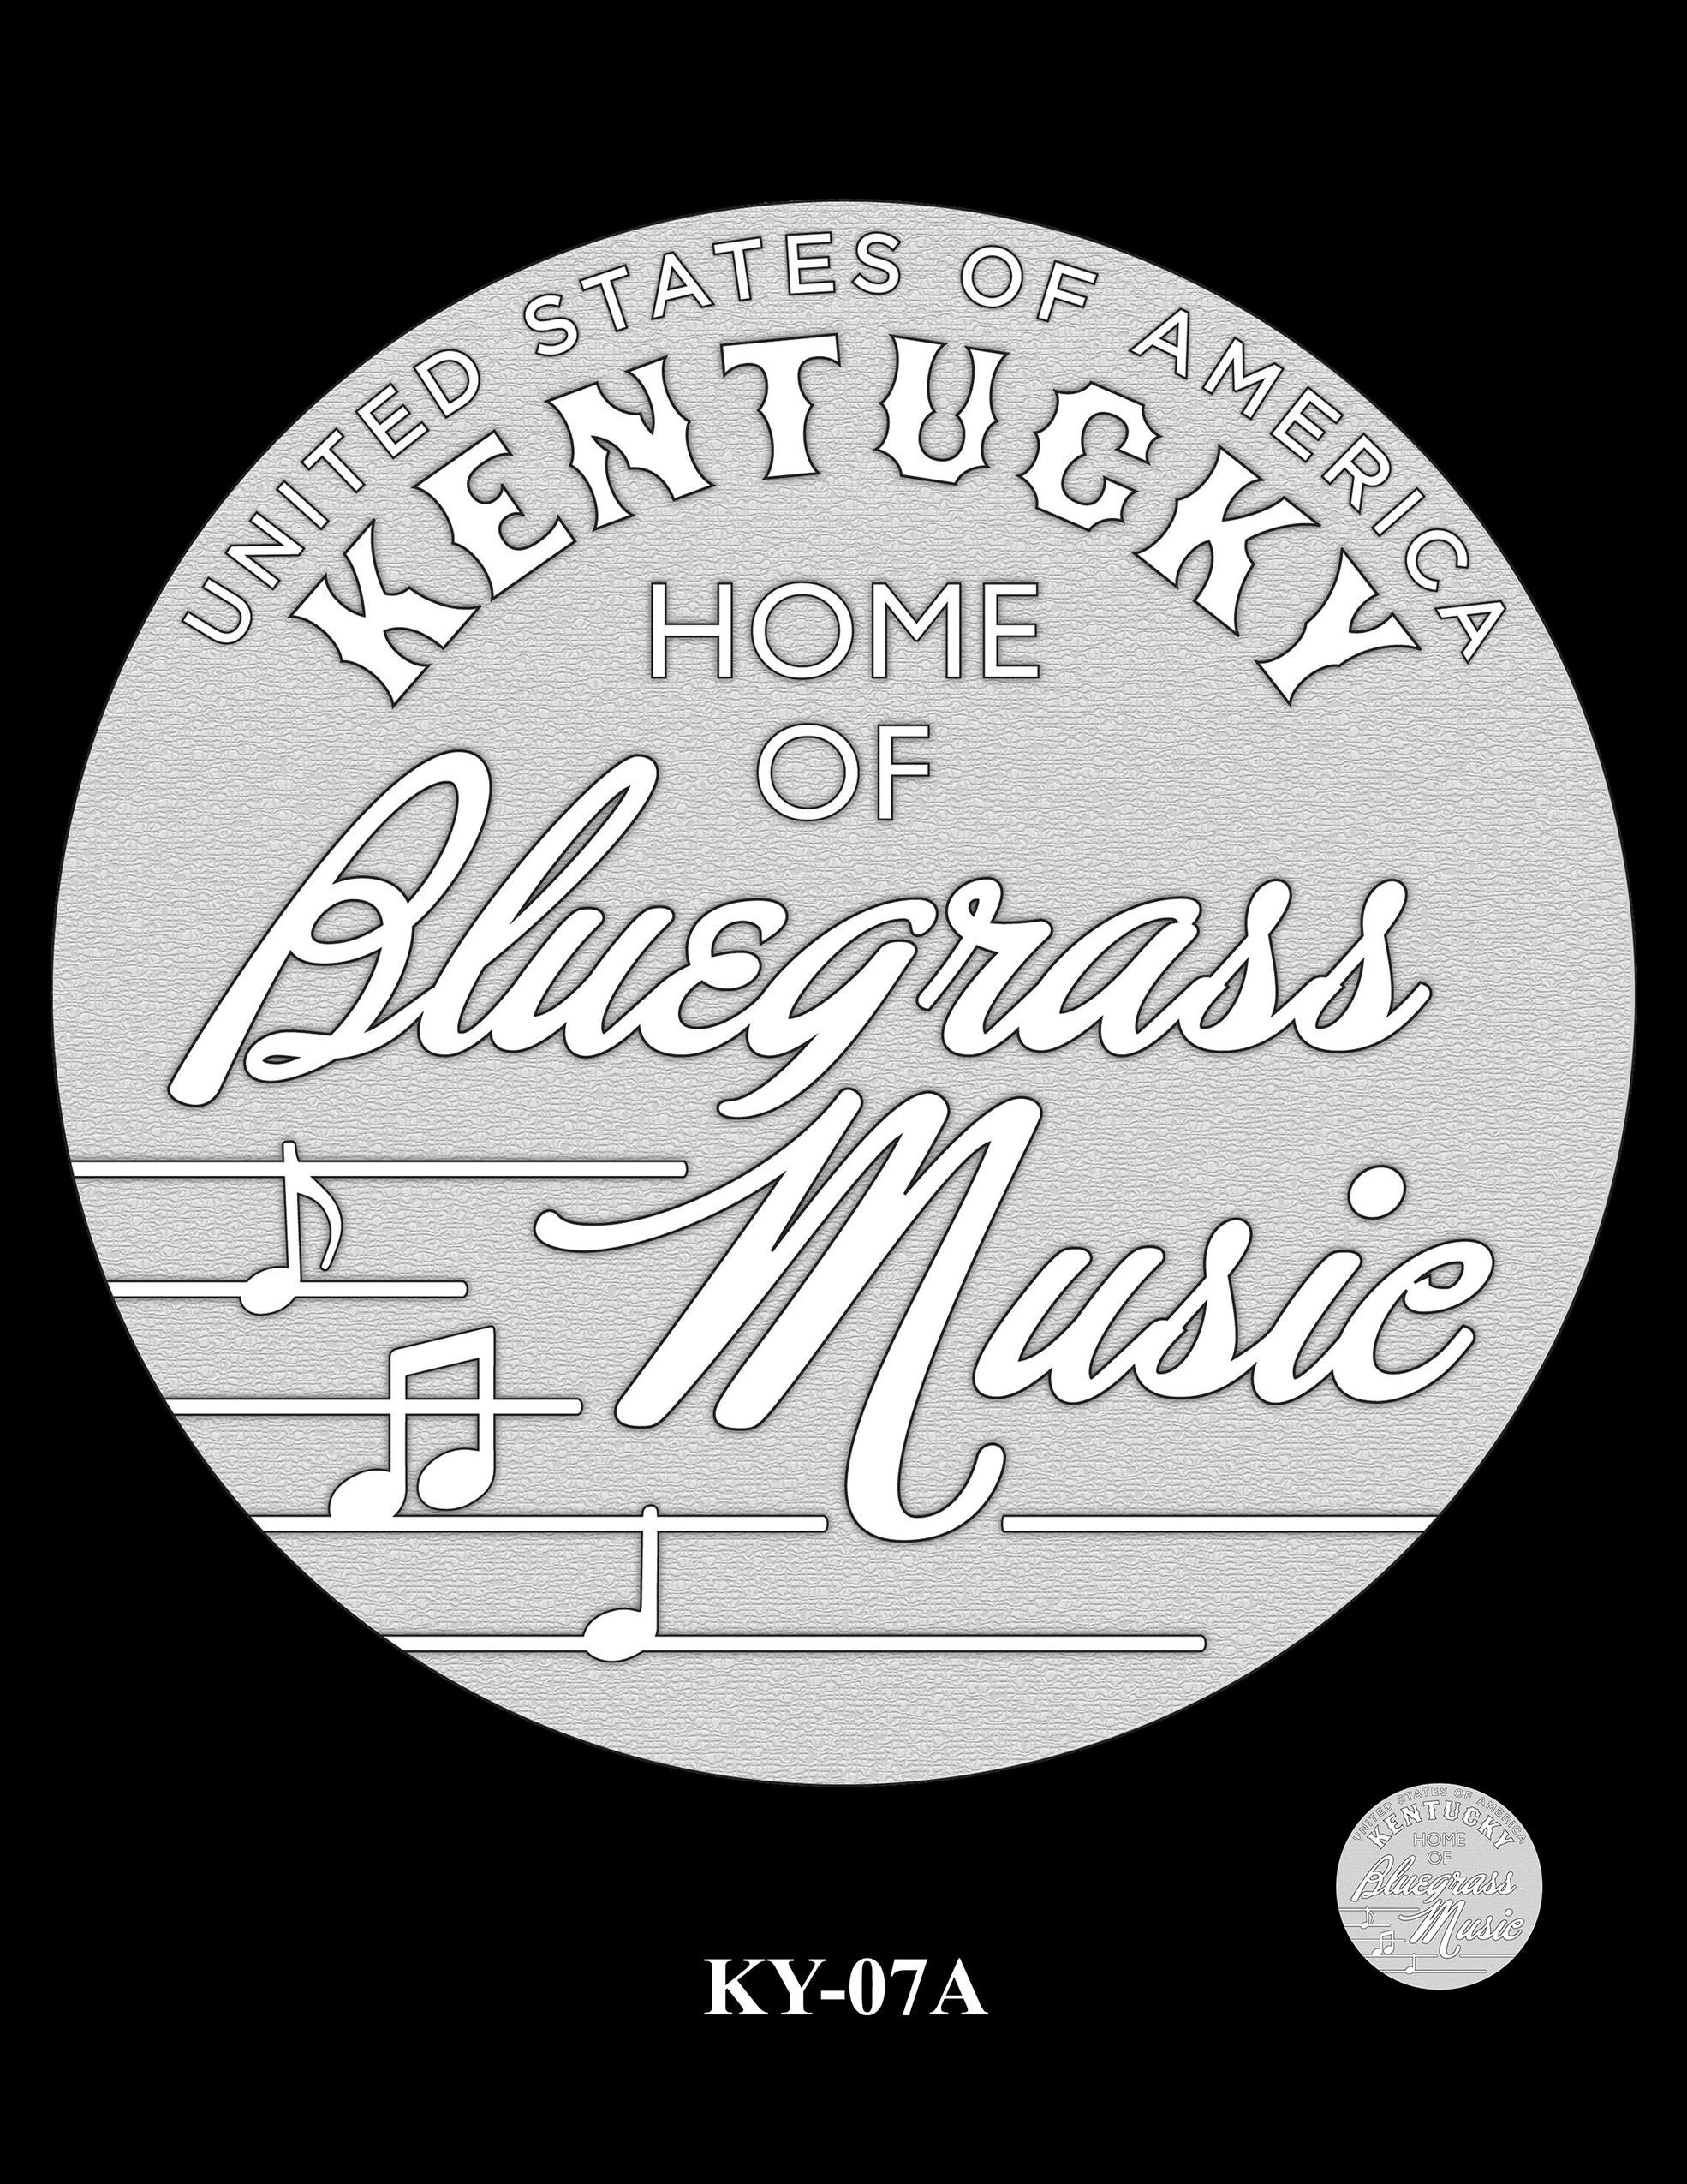 KY-07A -- 2022 American Innovation $1 Coin - Kentucky